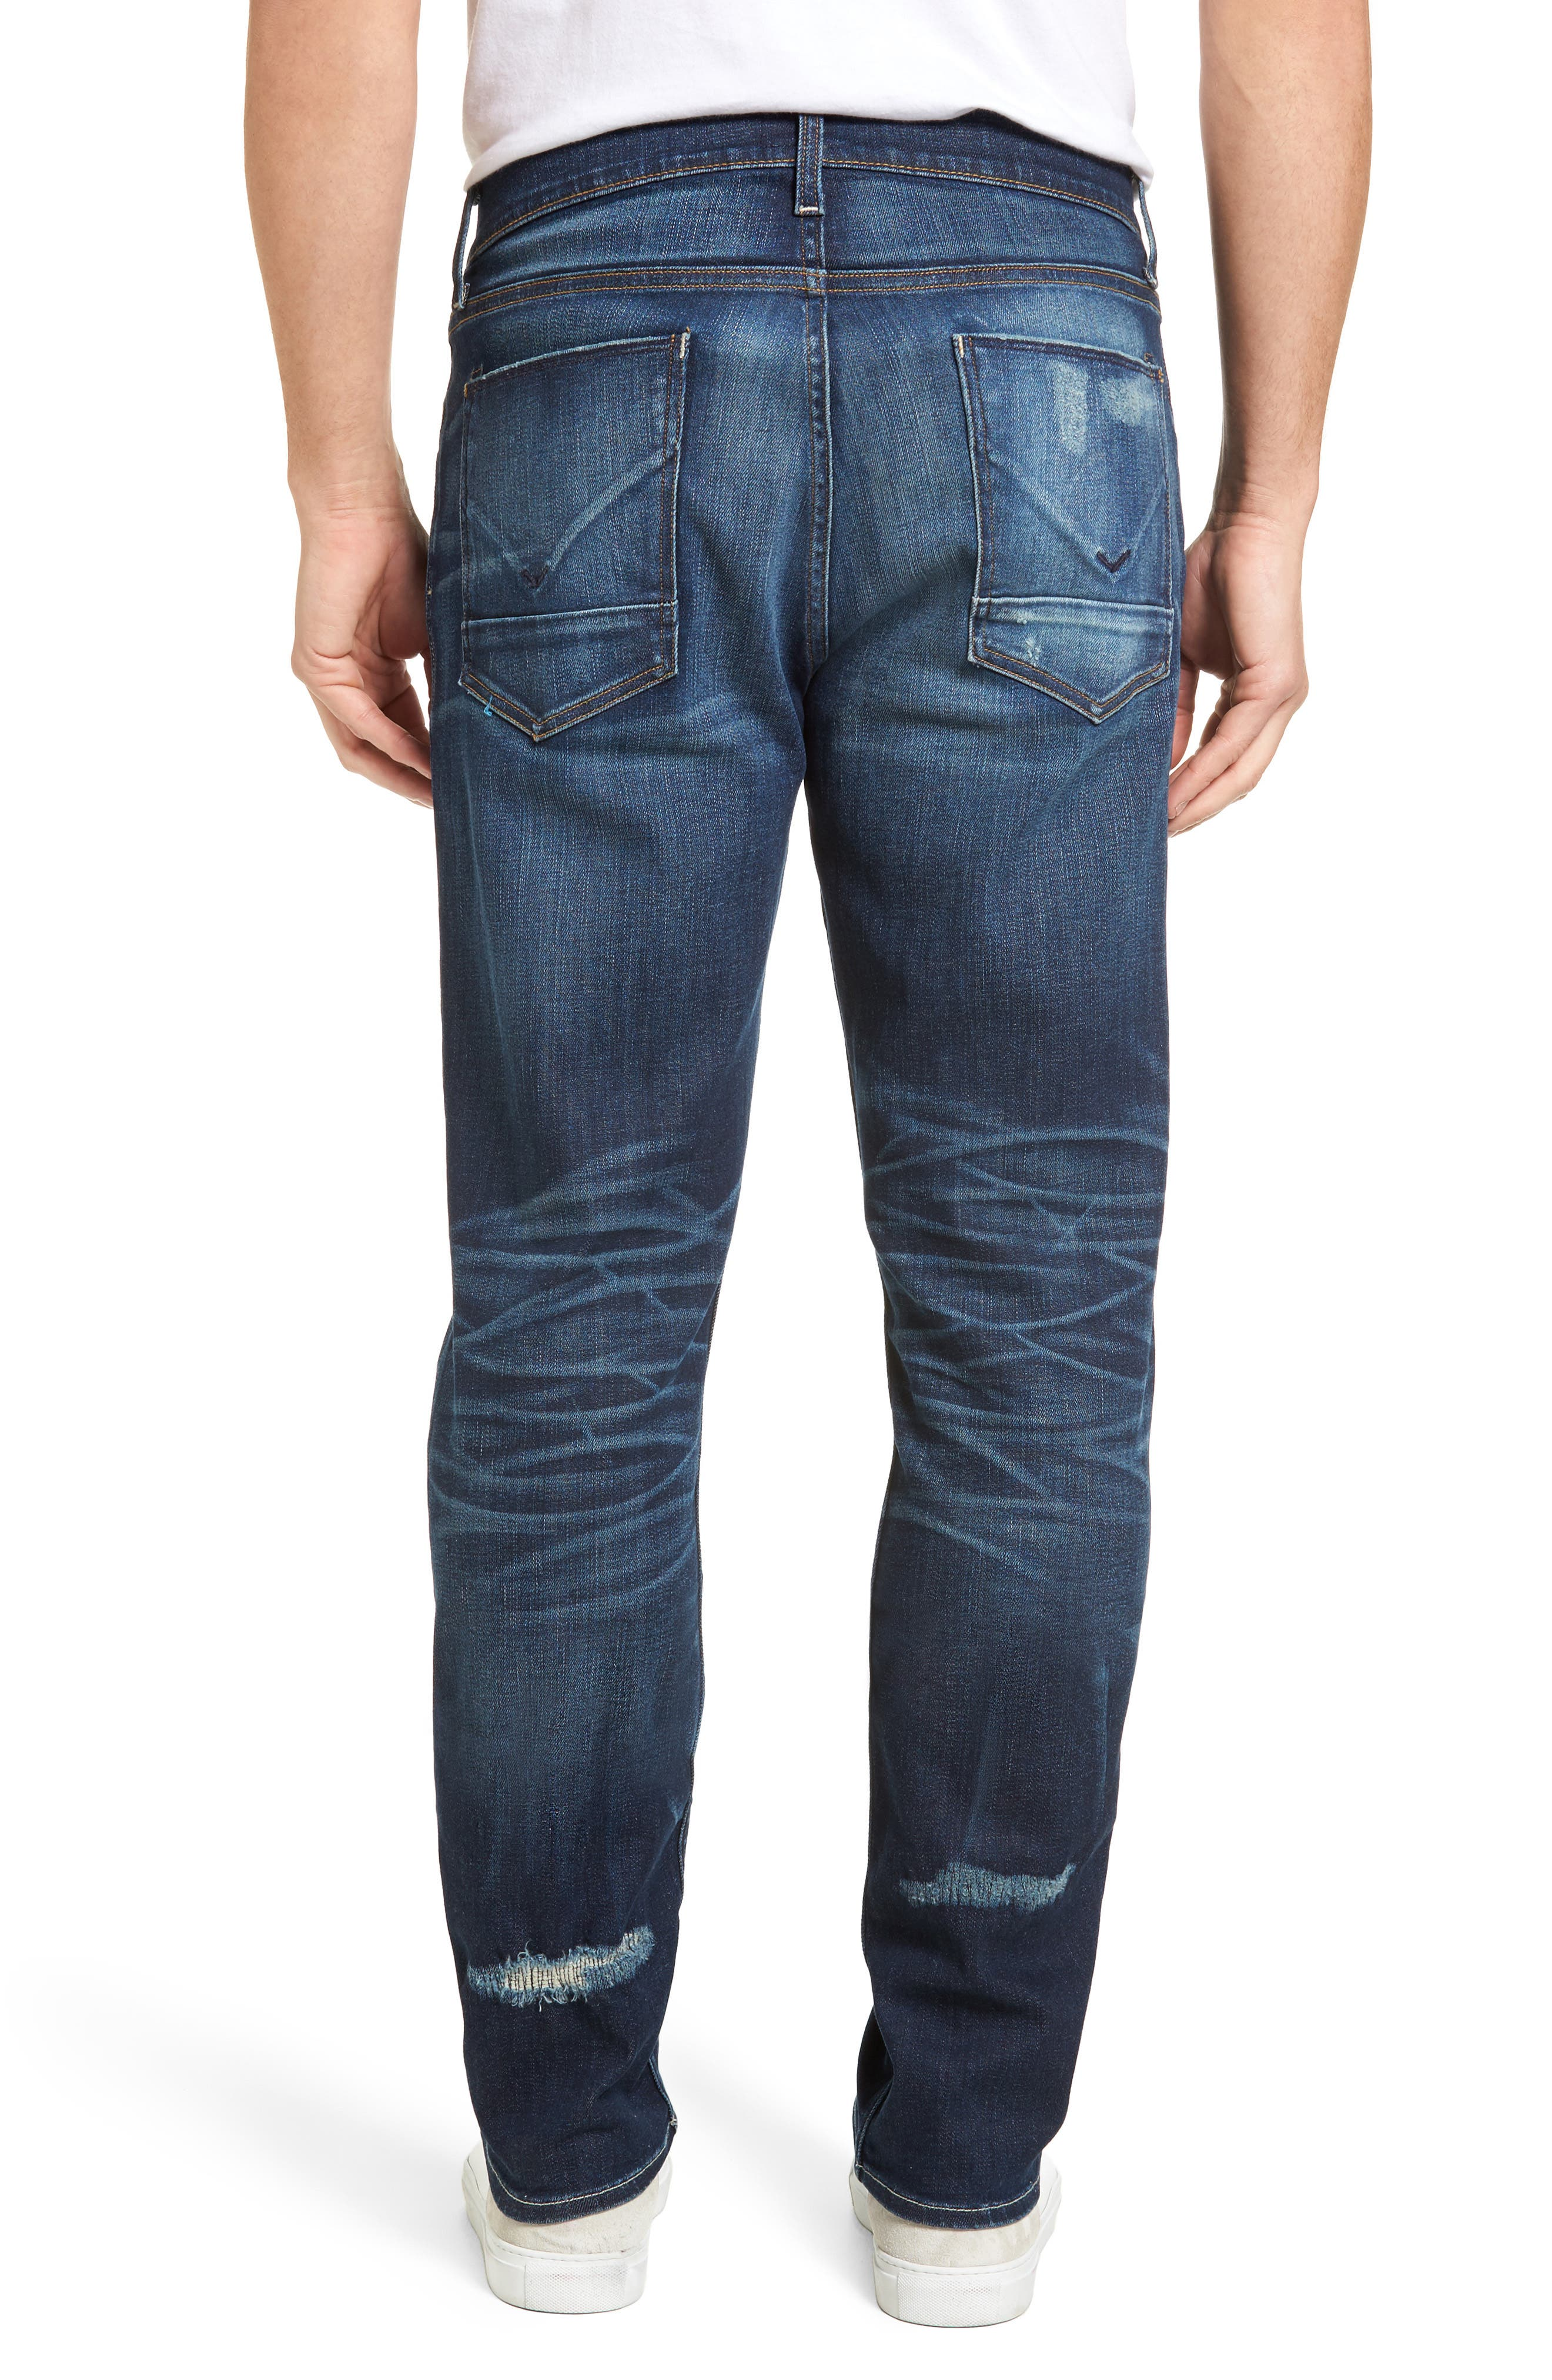 Blake Slim Fit Jeans,                             Alternate thumbnail 2, color,